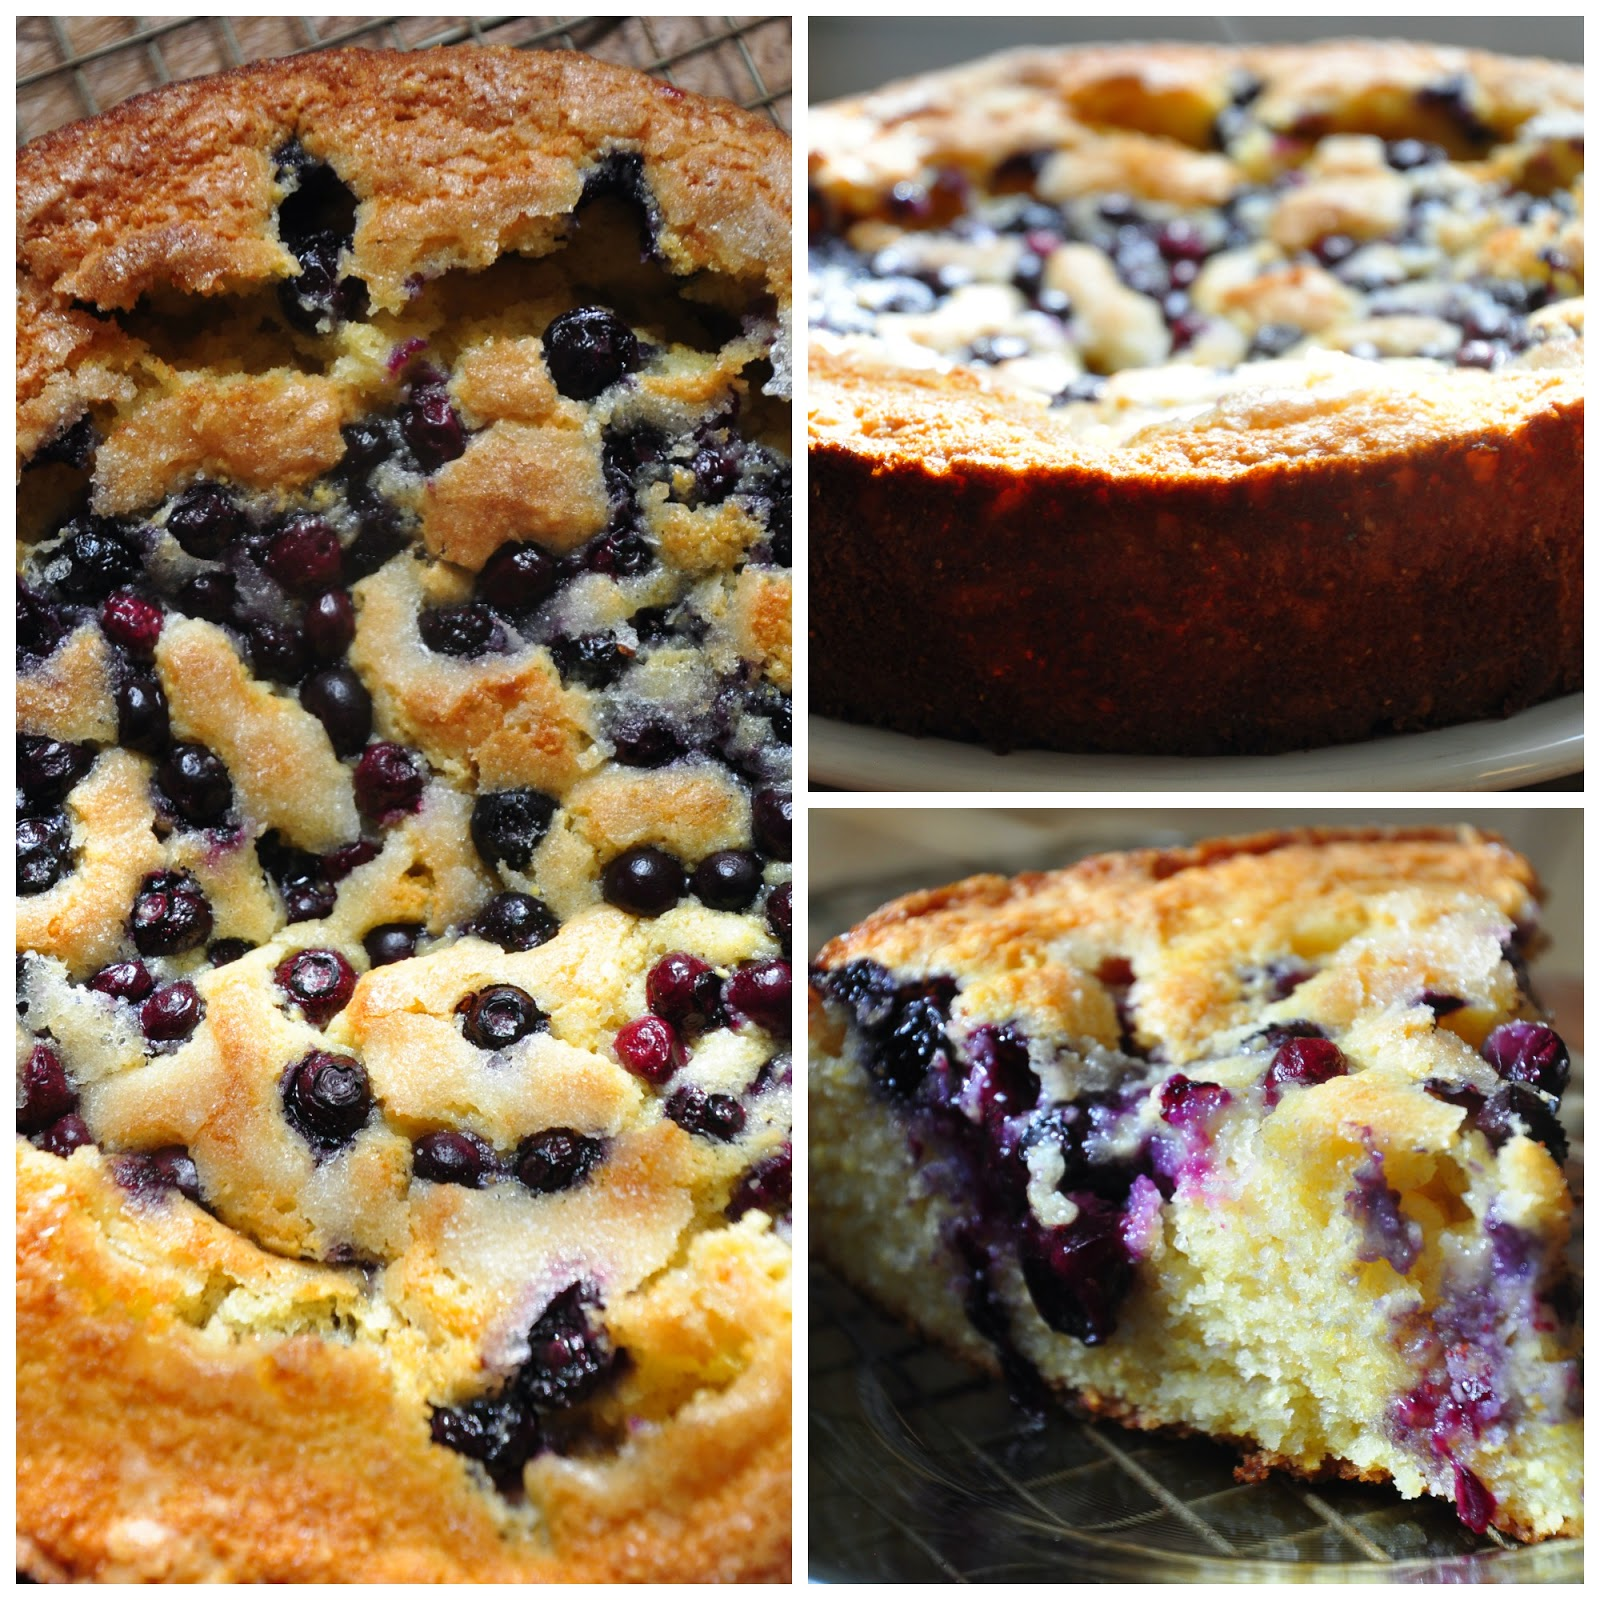 Huckleberry Blueberry Cornmeal Cake Recipe